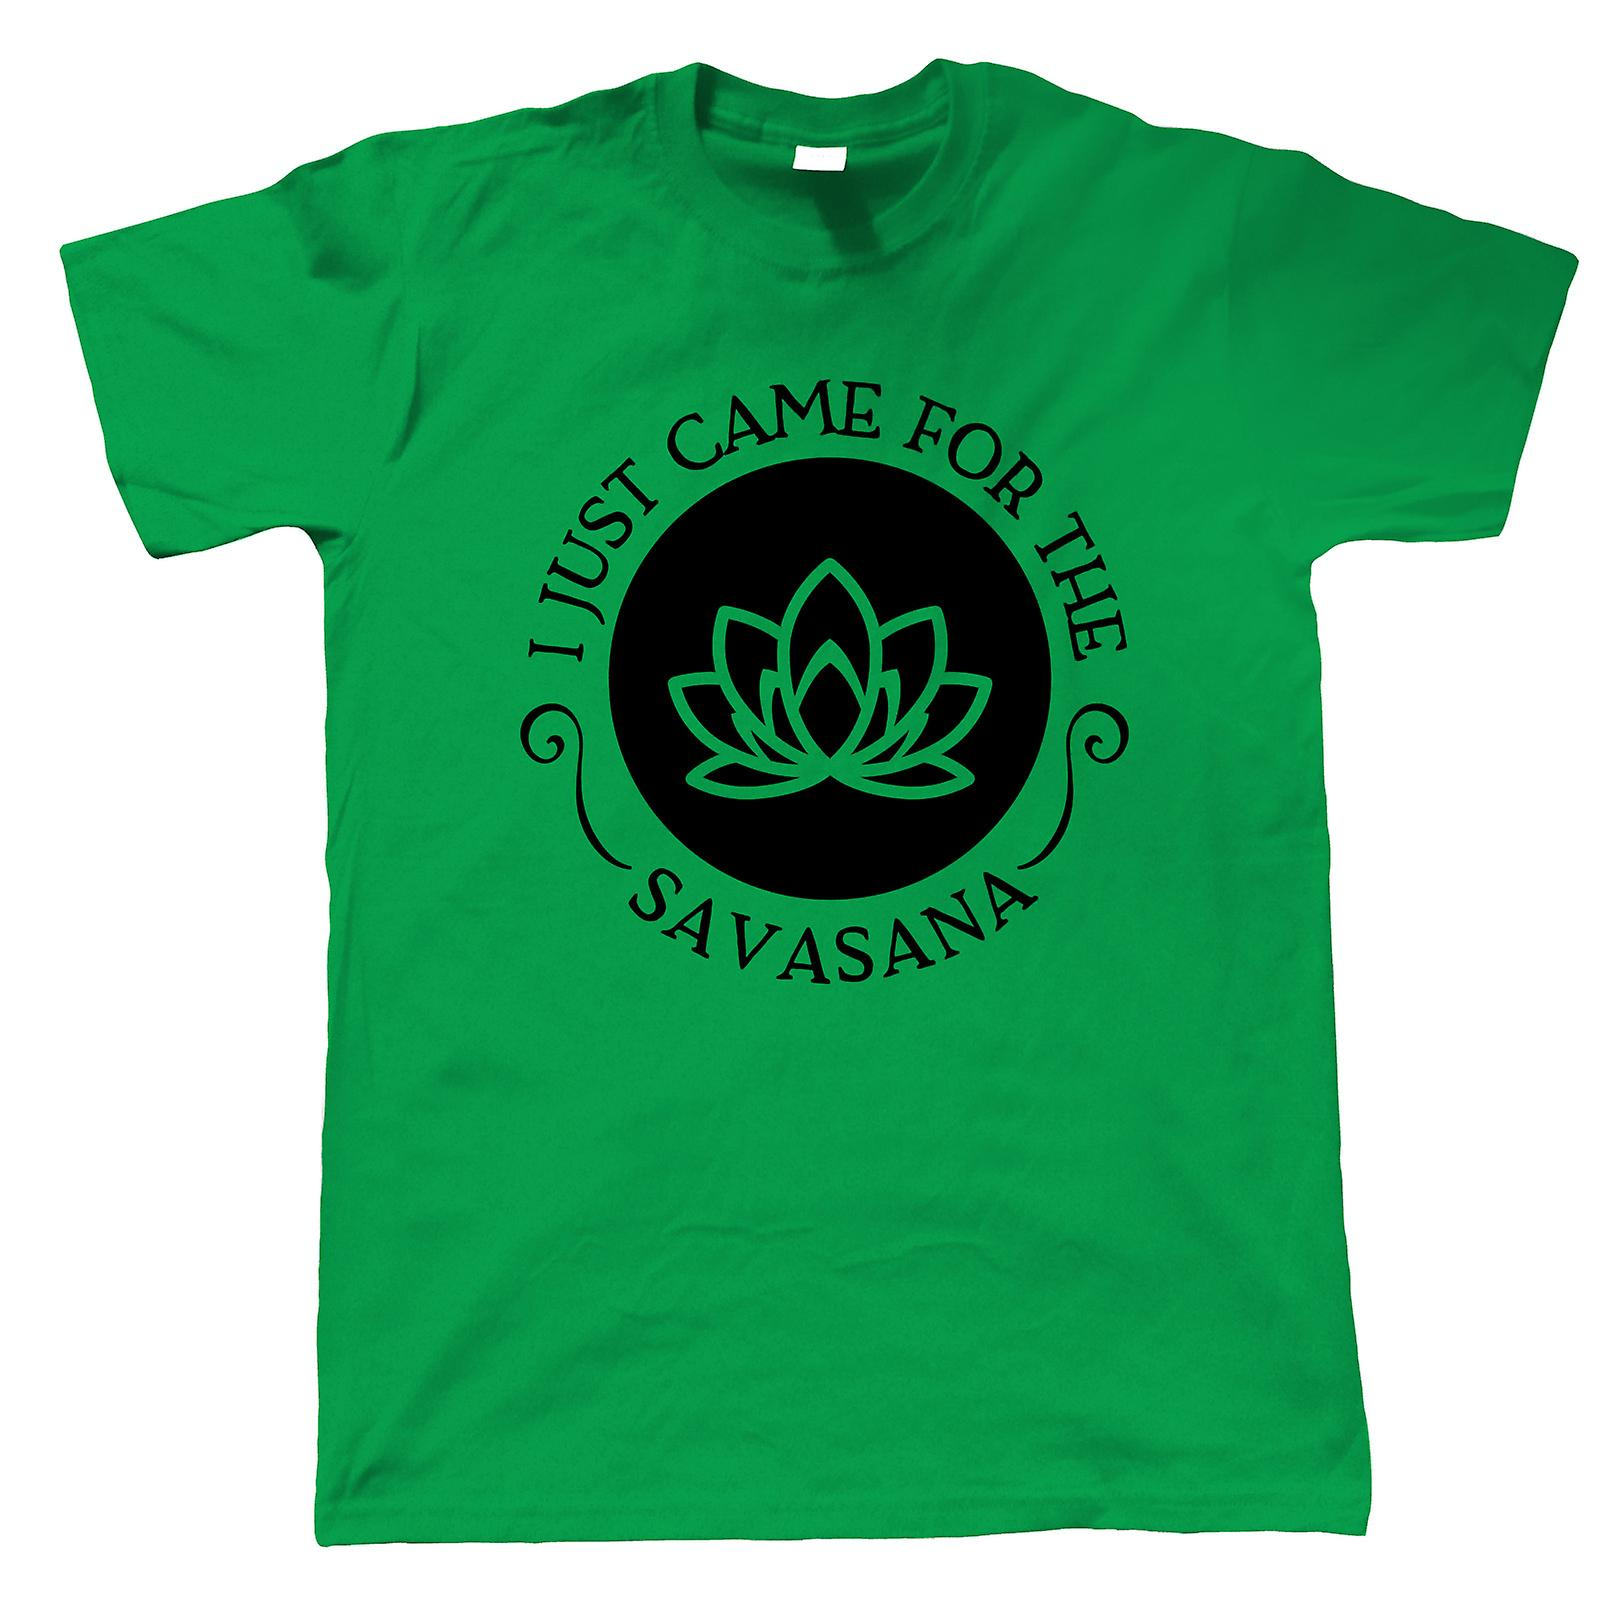 I Just Came For The Savasana, Mens T-Shirt - Yoga Gift Him ...